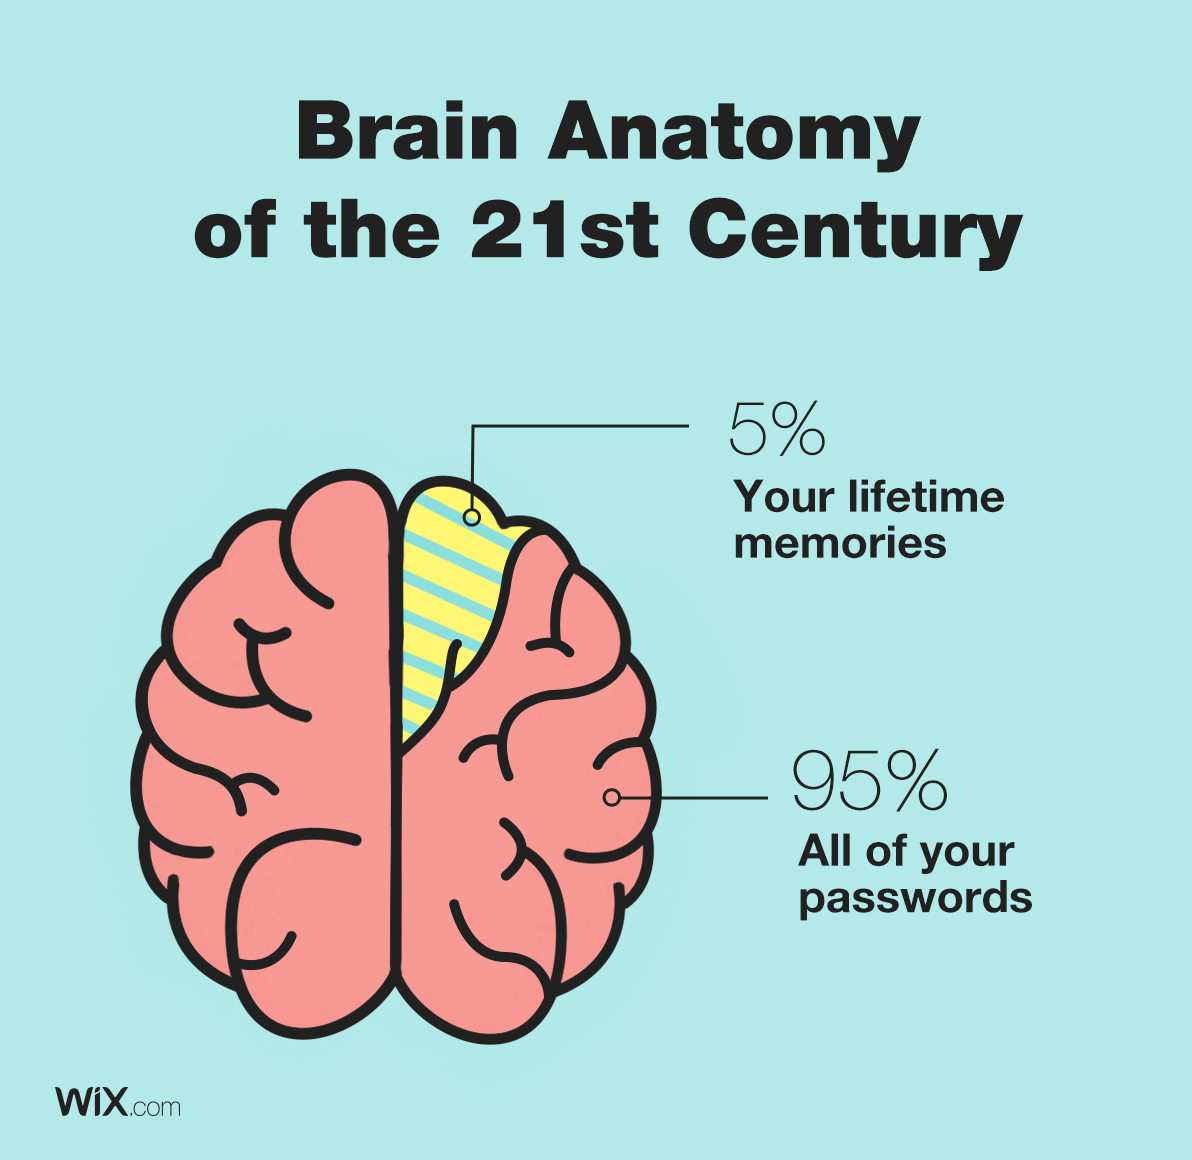 Brain Anatomy of the 21st Century | Pie Chart Jokes - Passwords ...